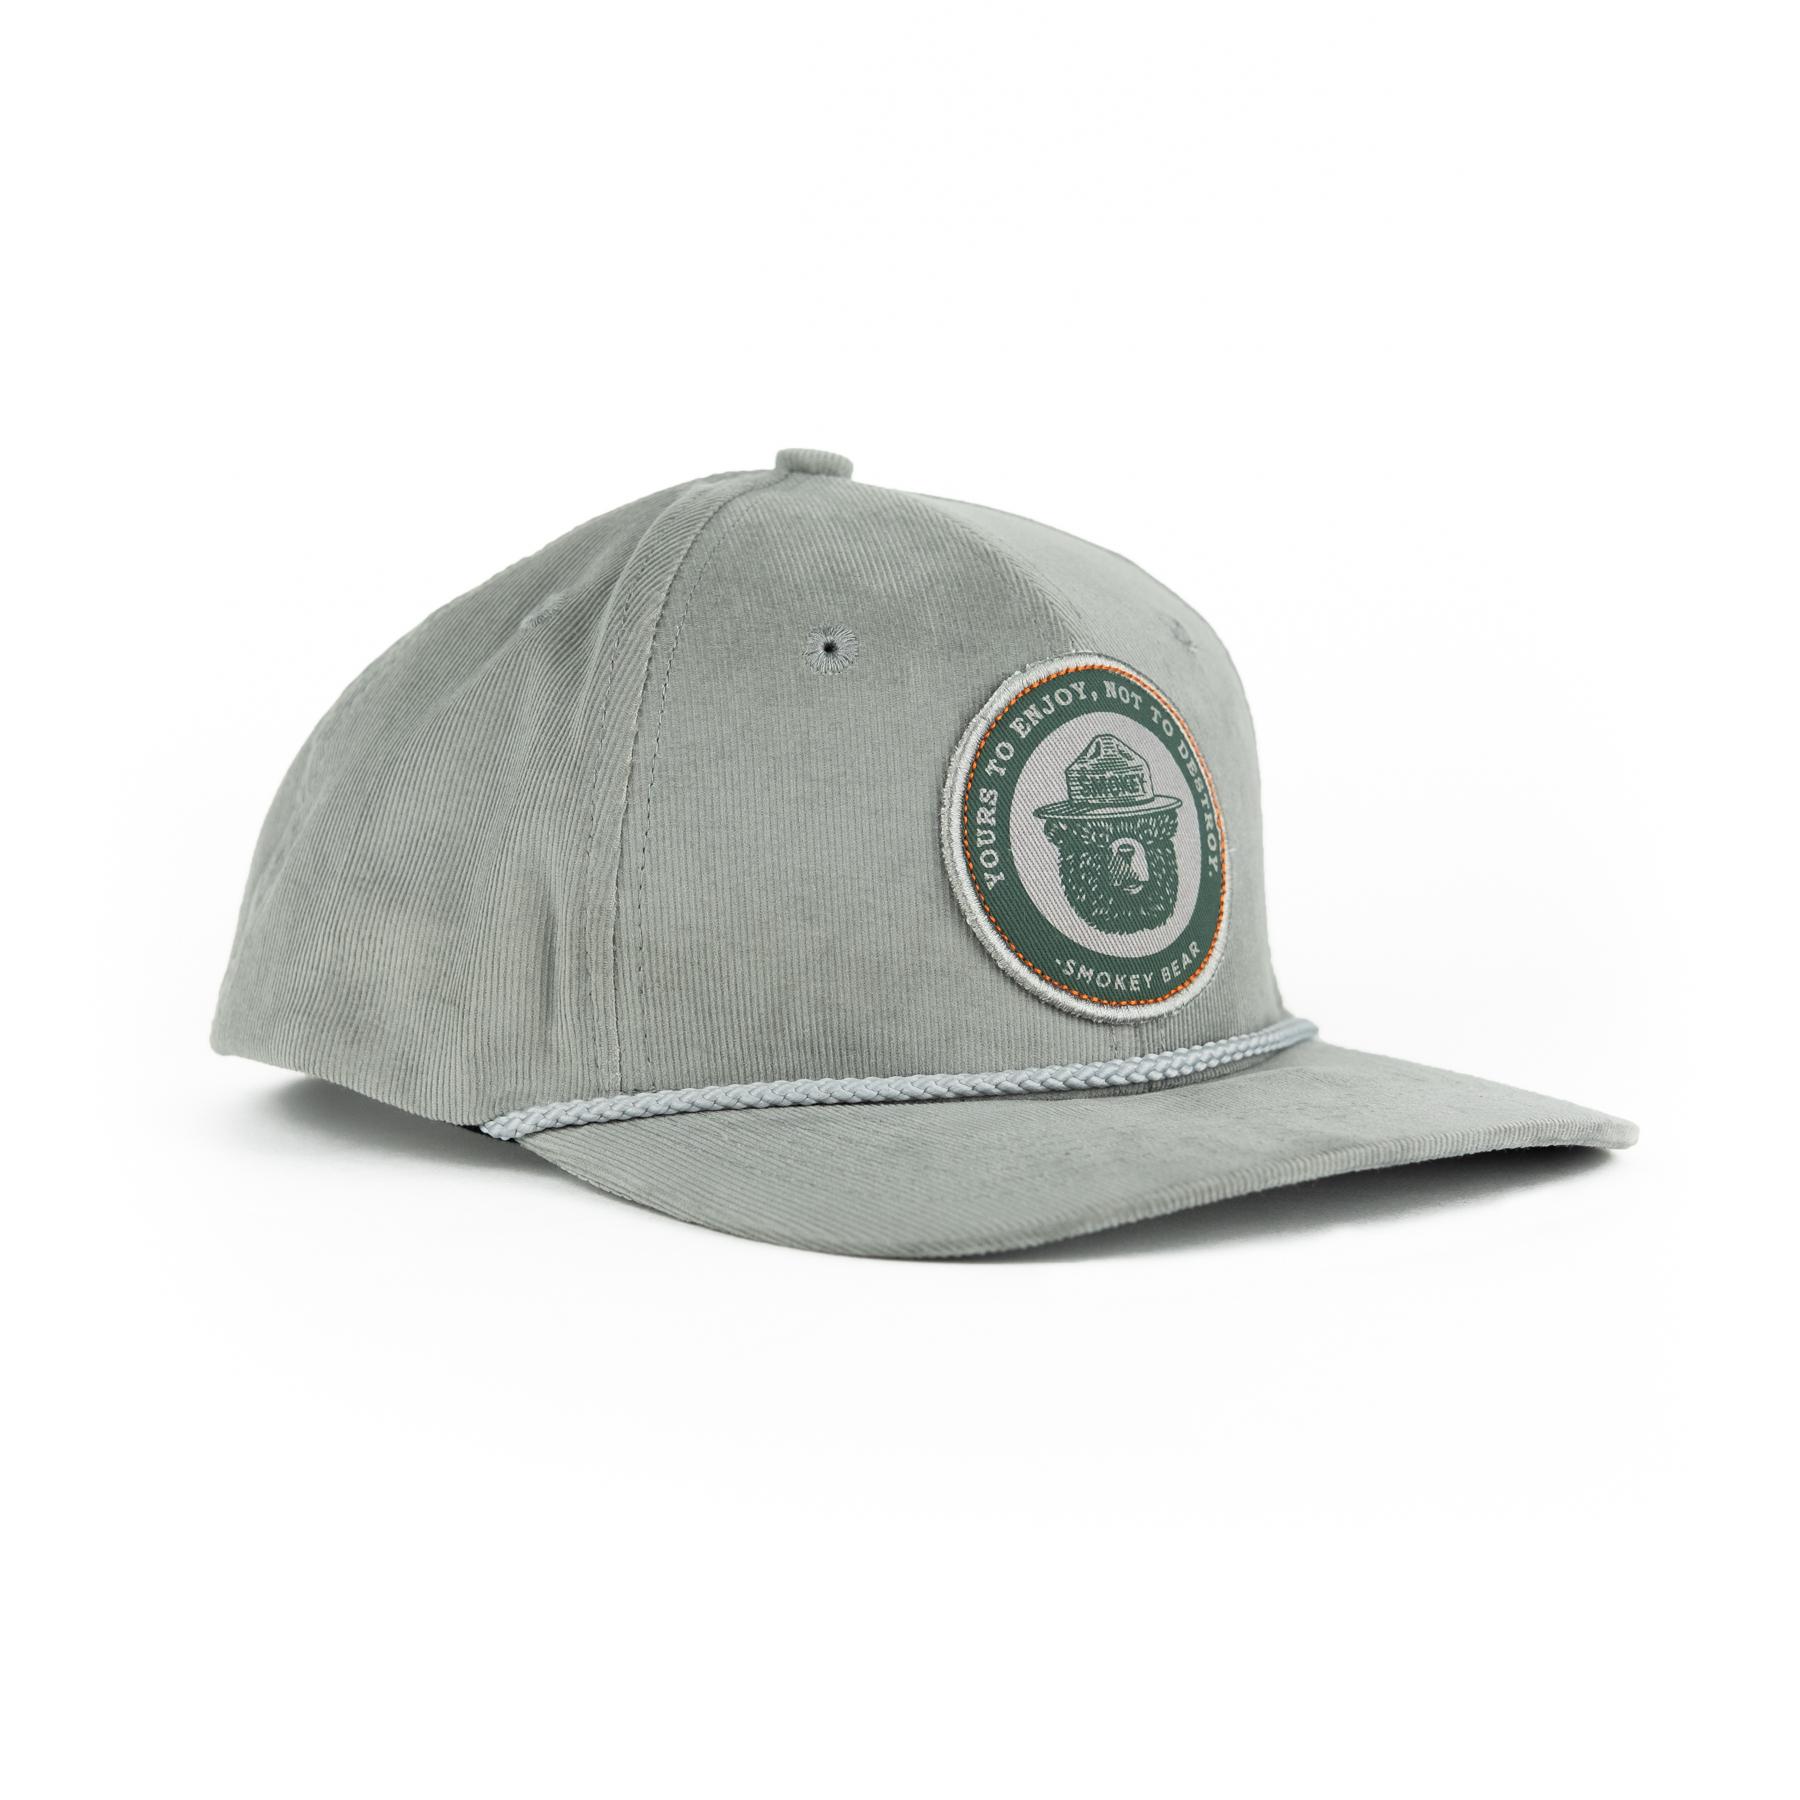 smokey-yours-to-enjoy-hat-01.jpg